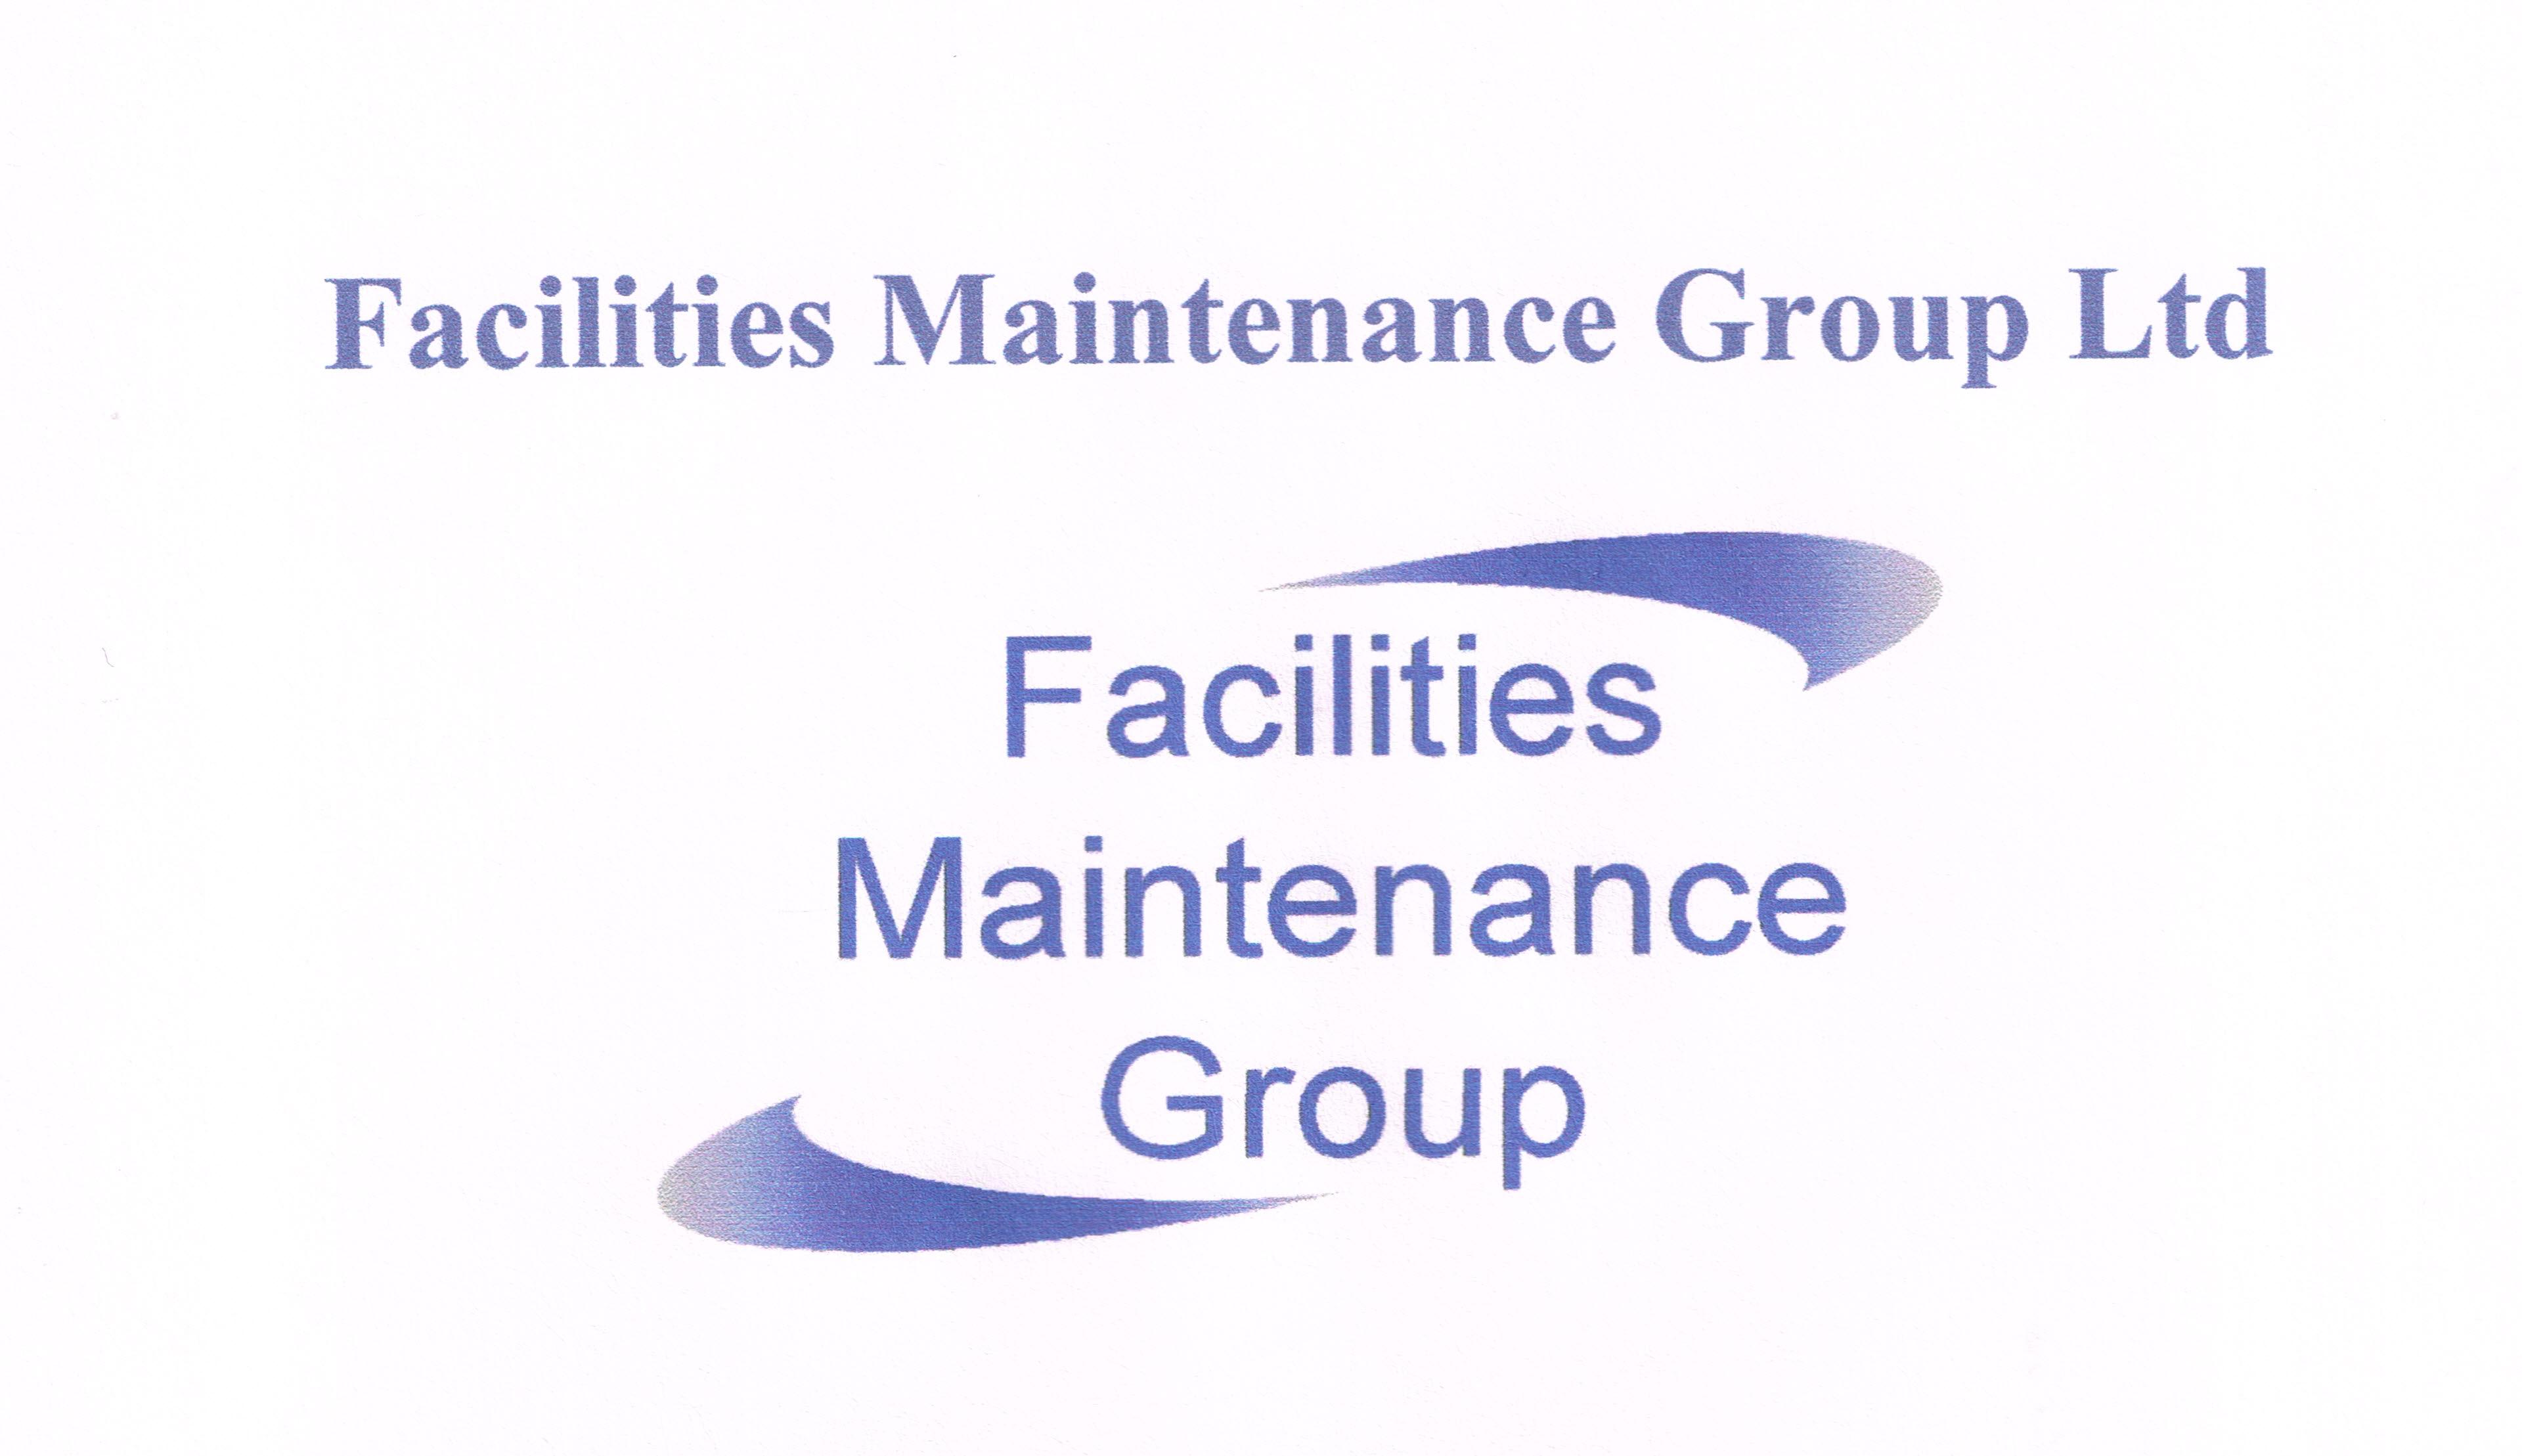 Facilities Maintenance Group